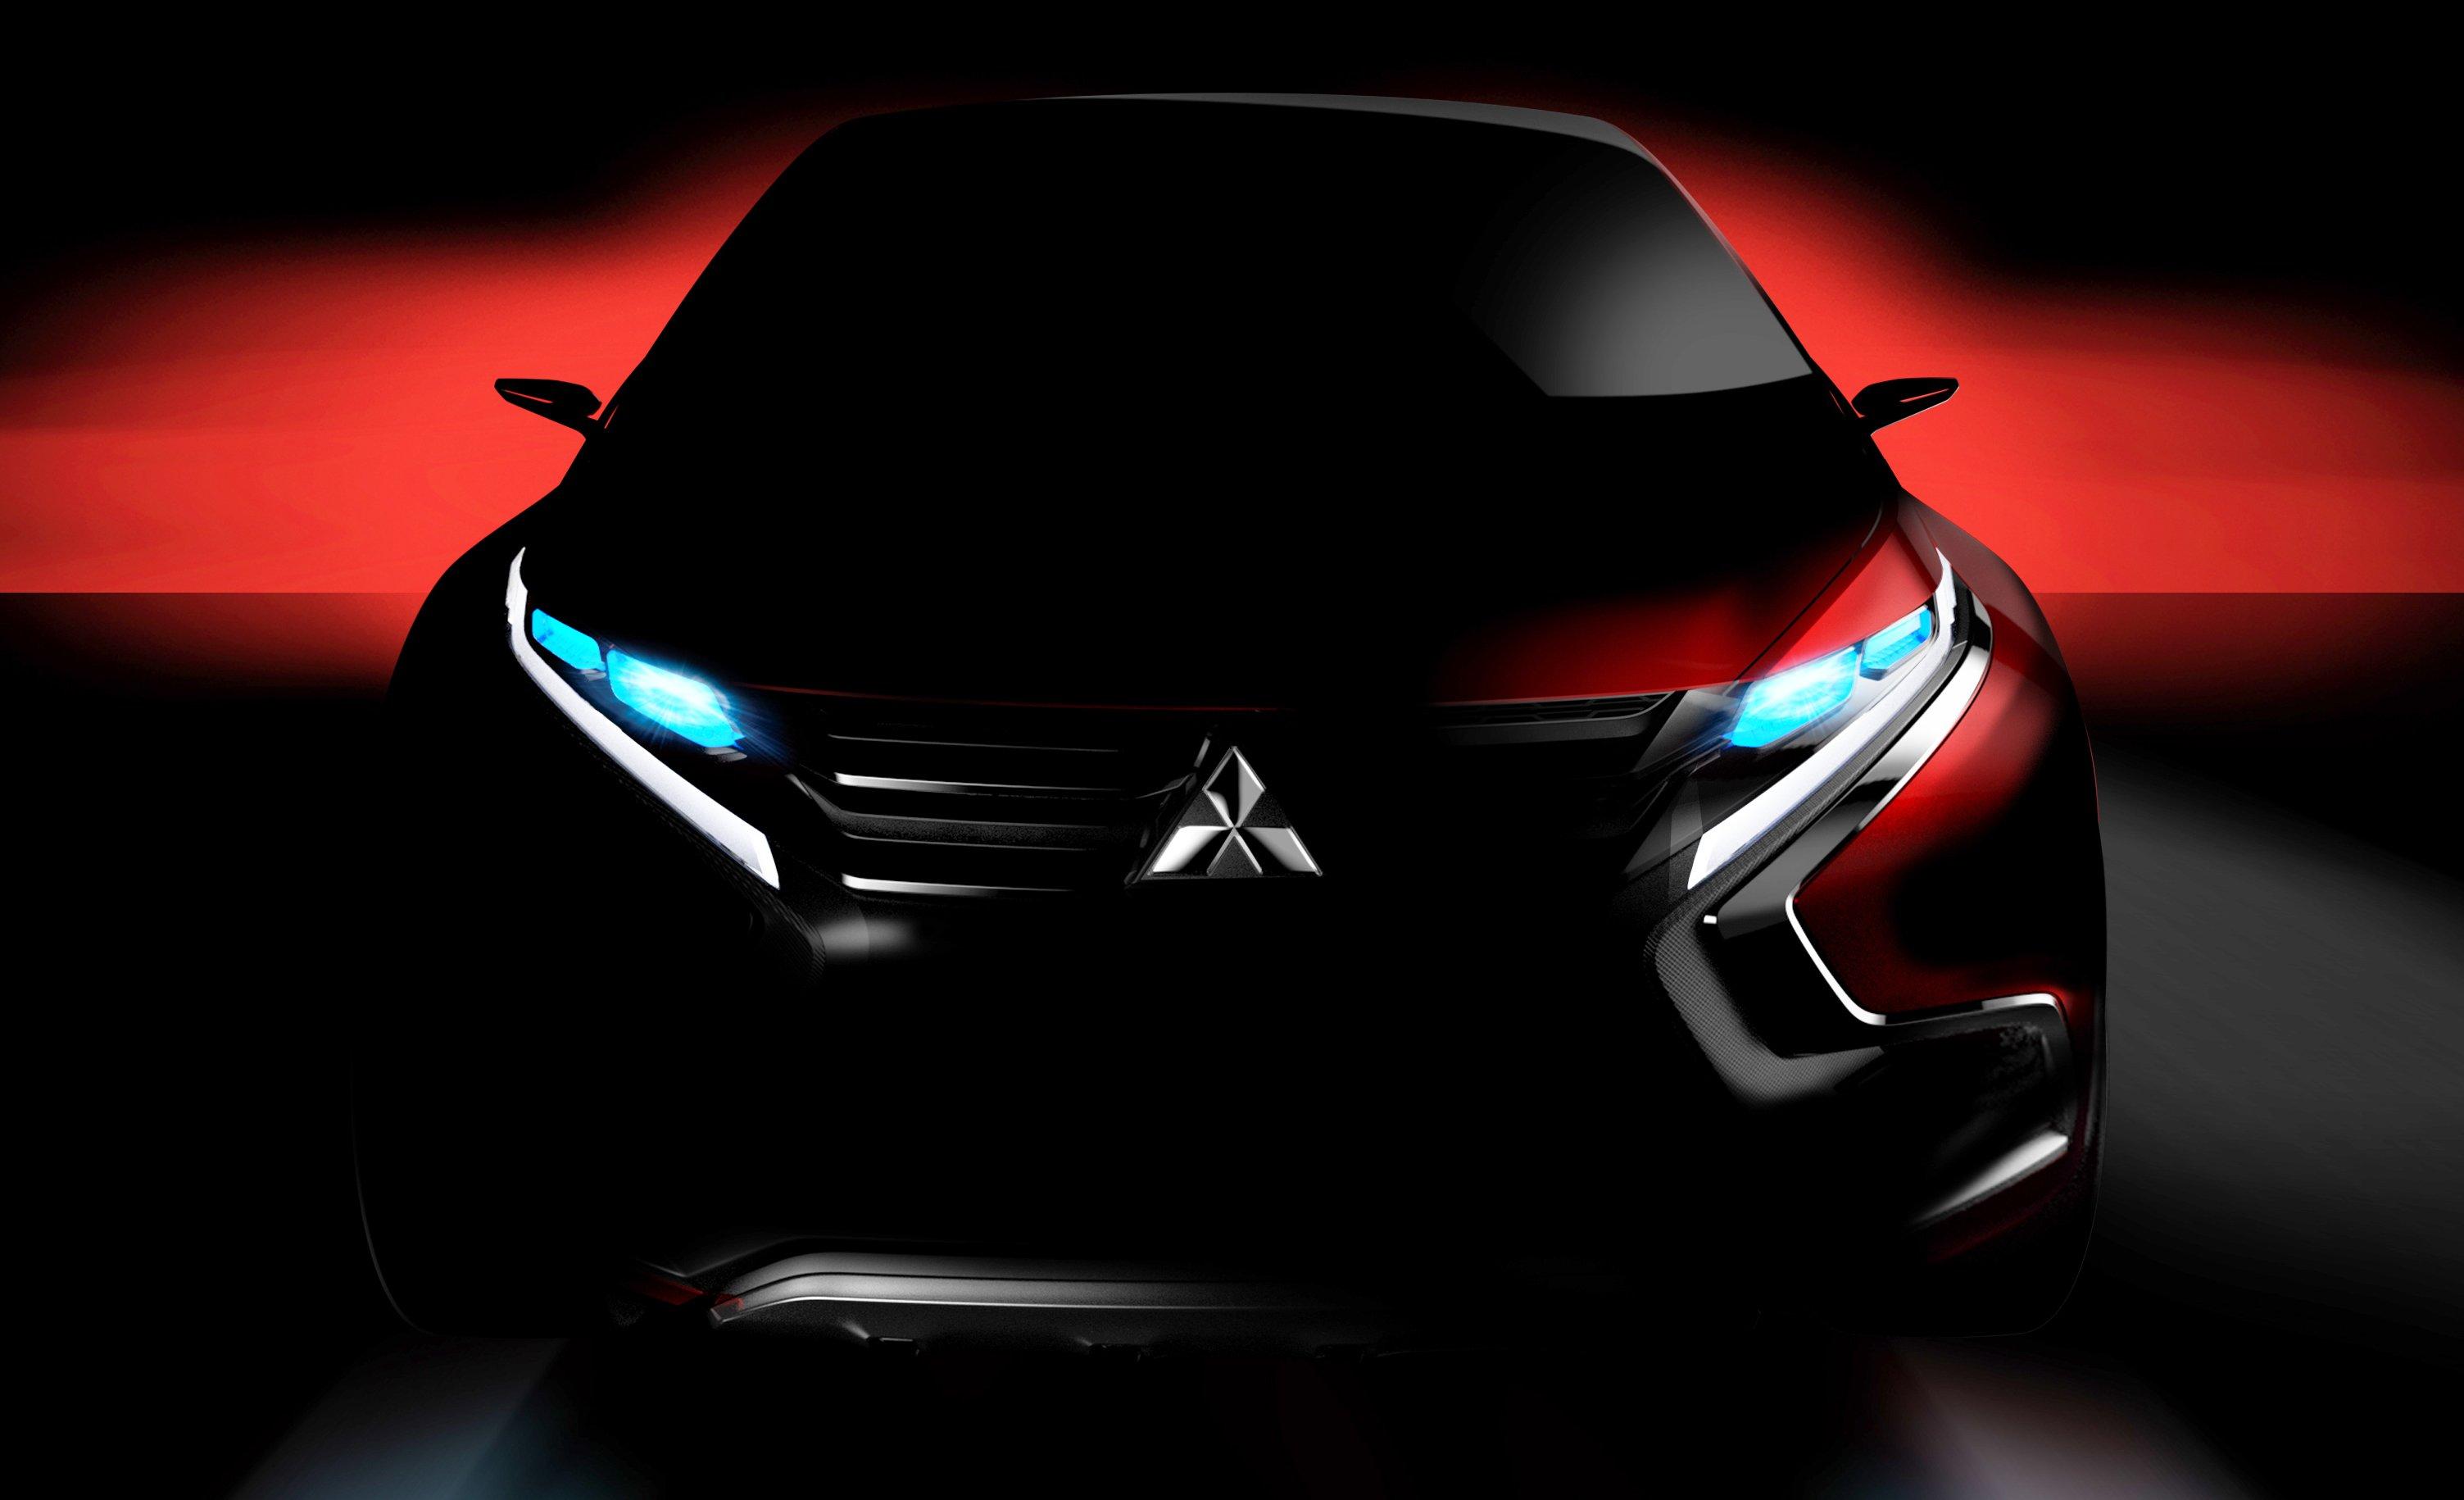 Mitsubishi Suv 2015 >> Mitsubishi Compact SUV Concept to debut at 2015 Geneva show – the Lancer Evolution reincarnated ...